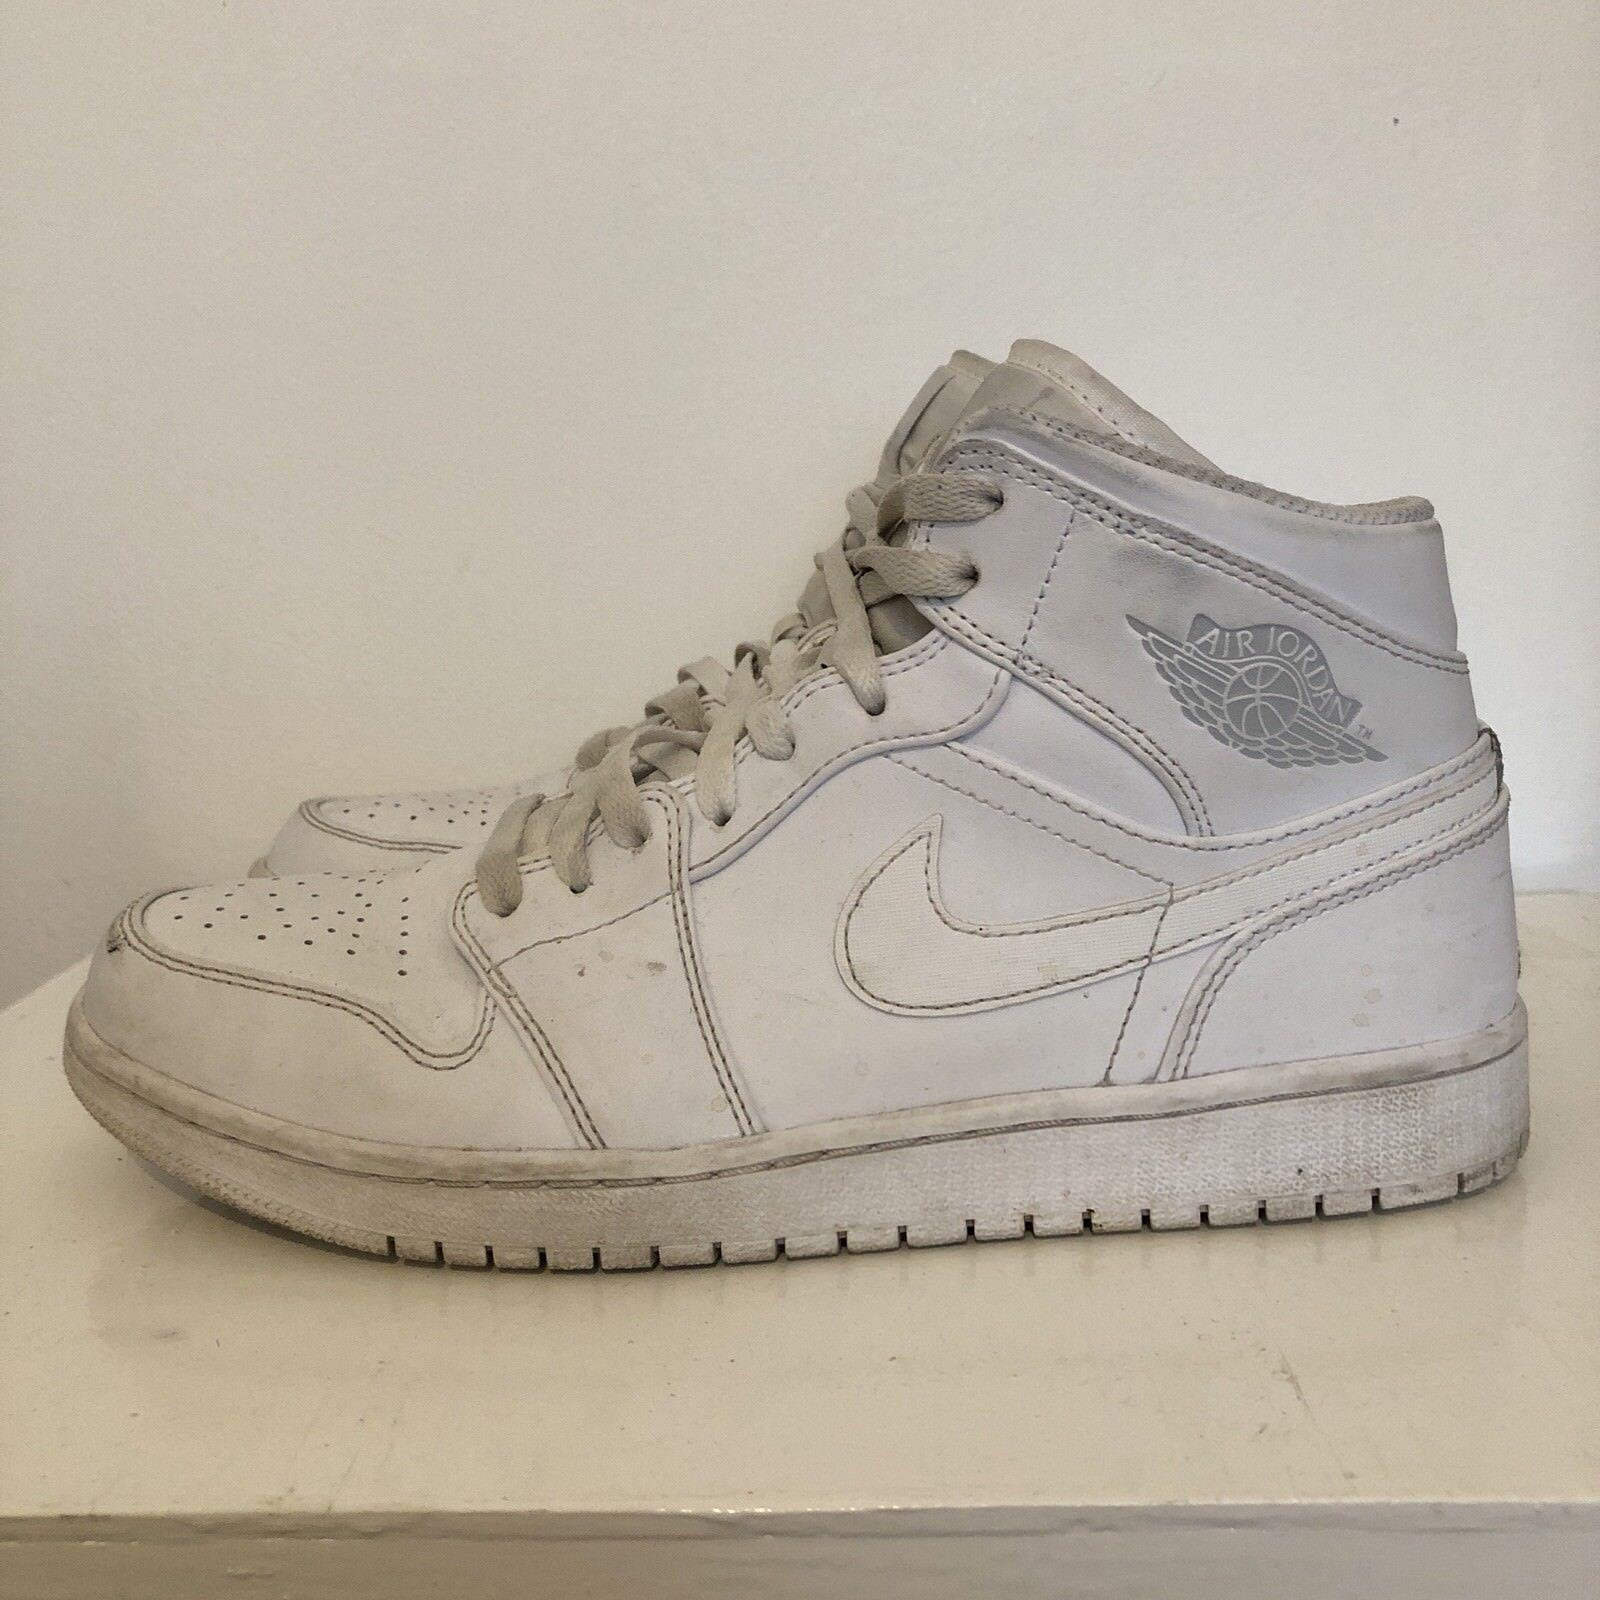 Nike Air Jordan 1 White Size 8.5